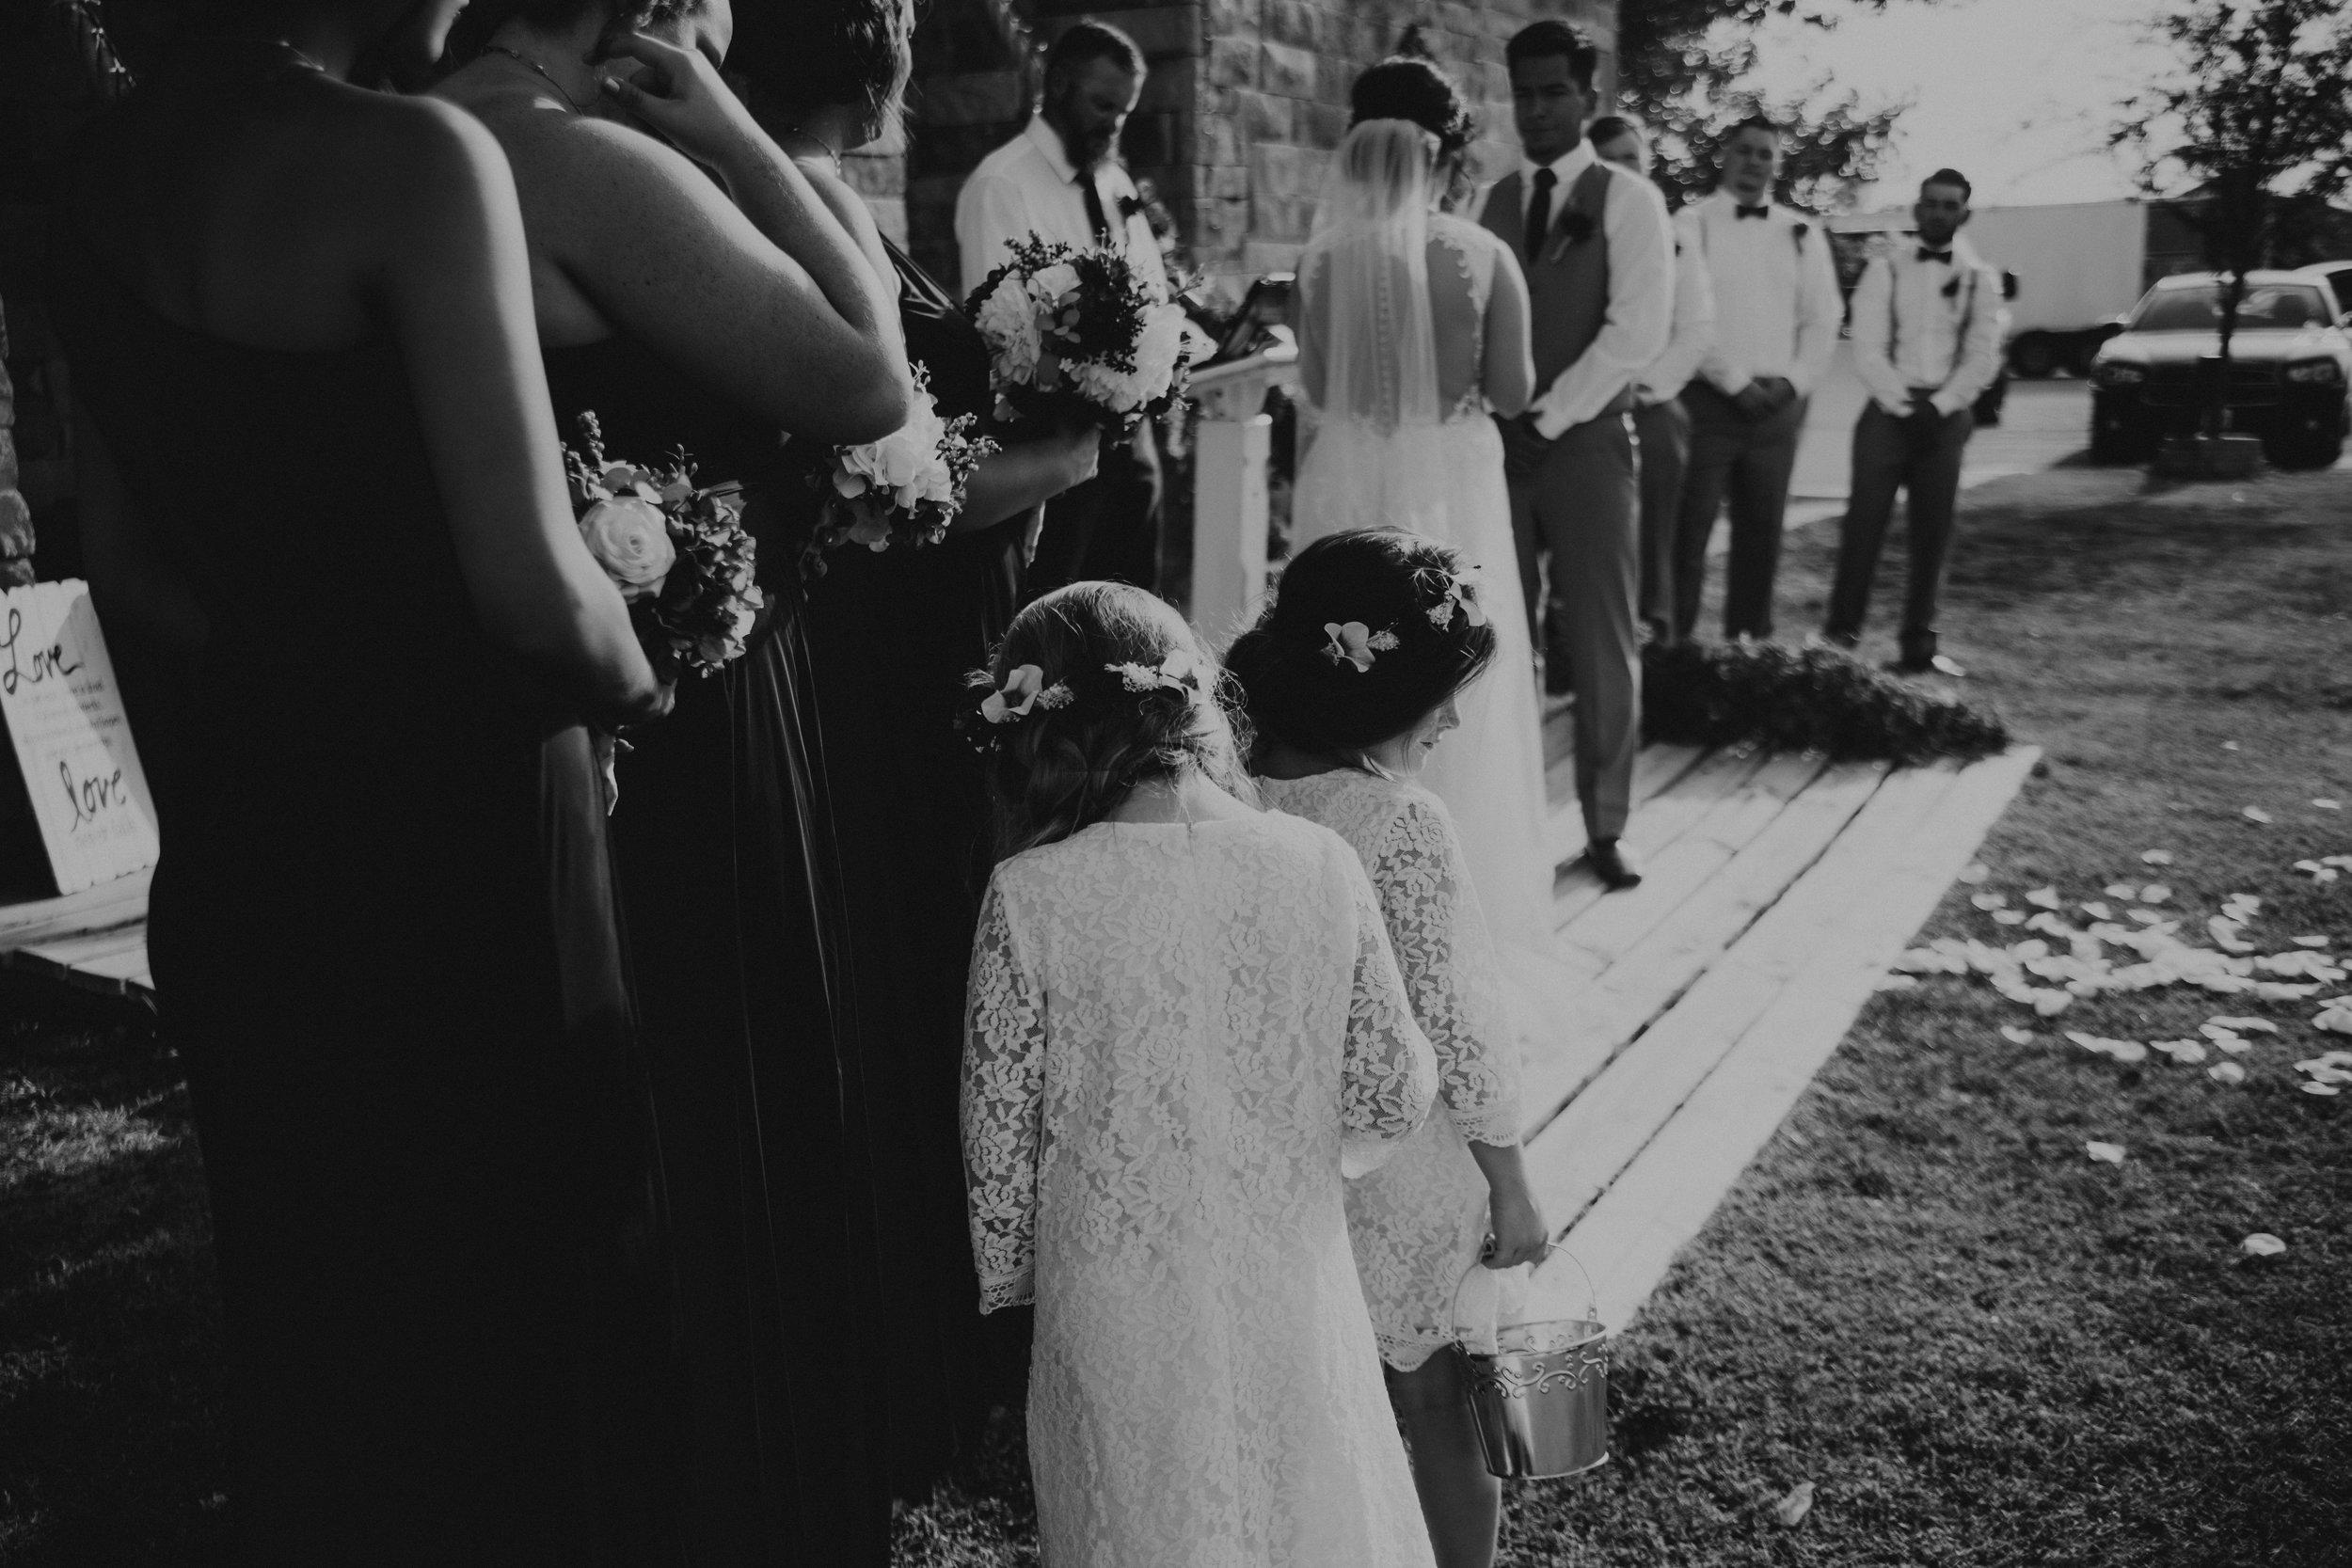 Lubbock,Texas WeddingDM7A1126.jpg